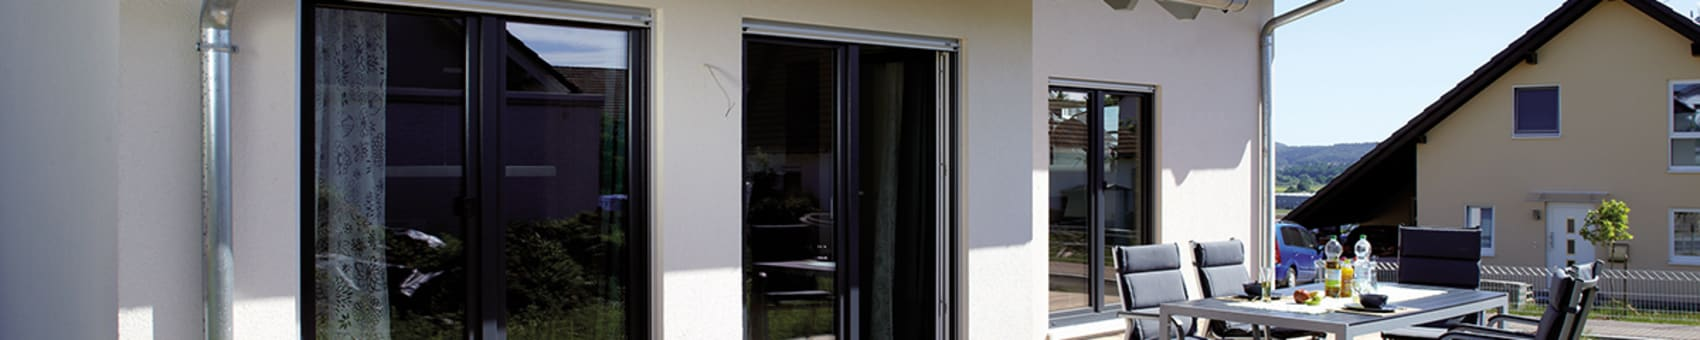 VIO 302 - Terrasse FingerHaus GmbH - Bauunternehmen in Frankenberg (Eder) Moderner Balkon, Veranda & Terrasse